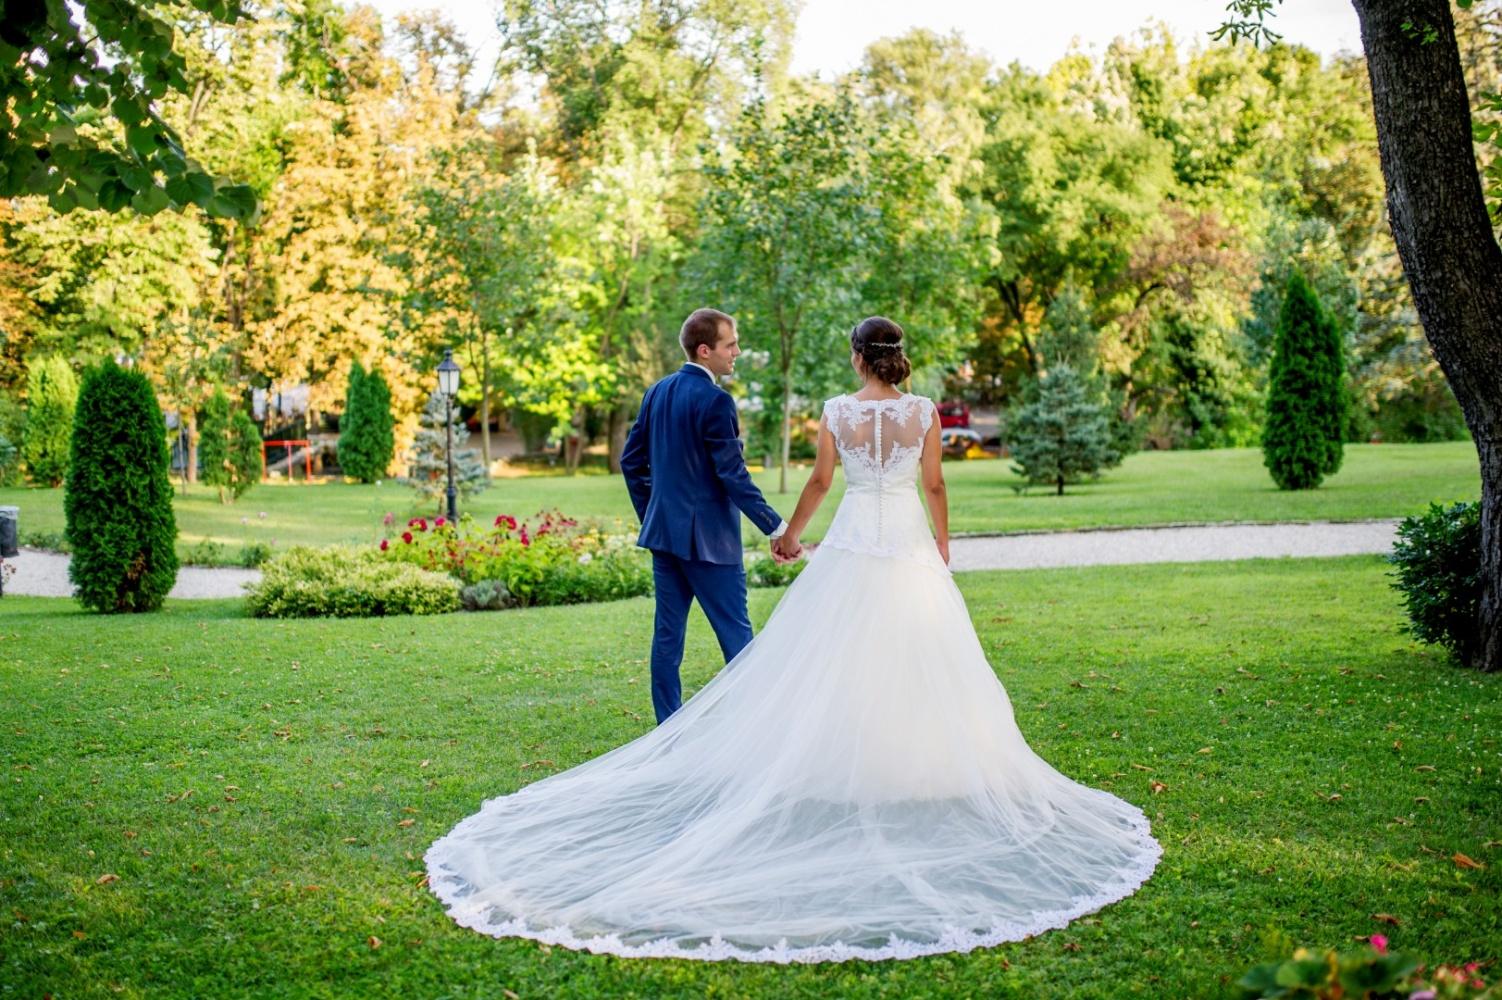 http://www.fotoz.sk/images/gallery-41/normal/eskuvoi-fotos_svadobny-fotograf_juraj-zsok_lacny-fotograf_olcso-eskuvoi-fotos_fotograf-nitra_budapesti-fotos_prewedding__039.jpg